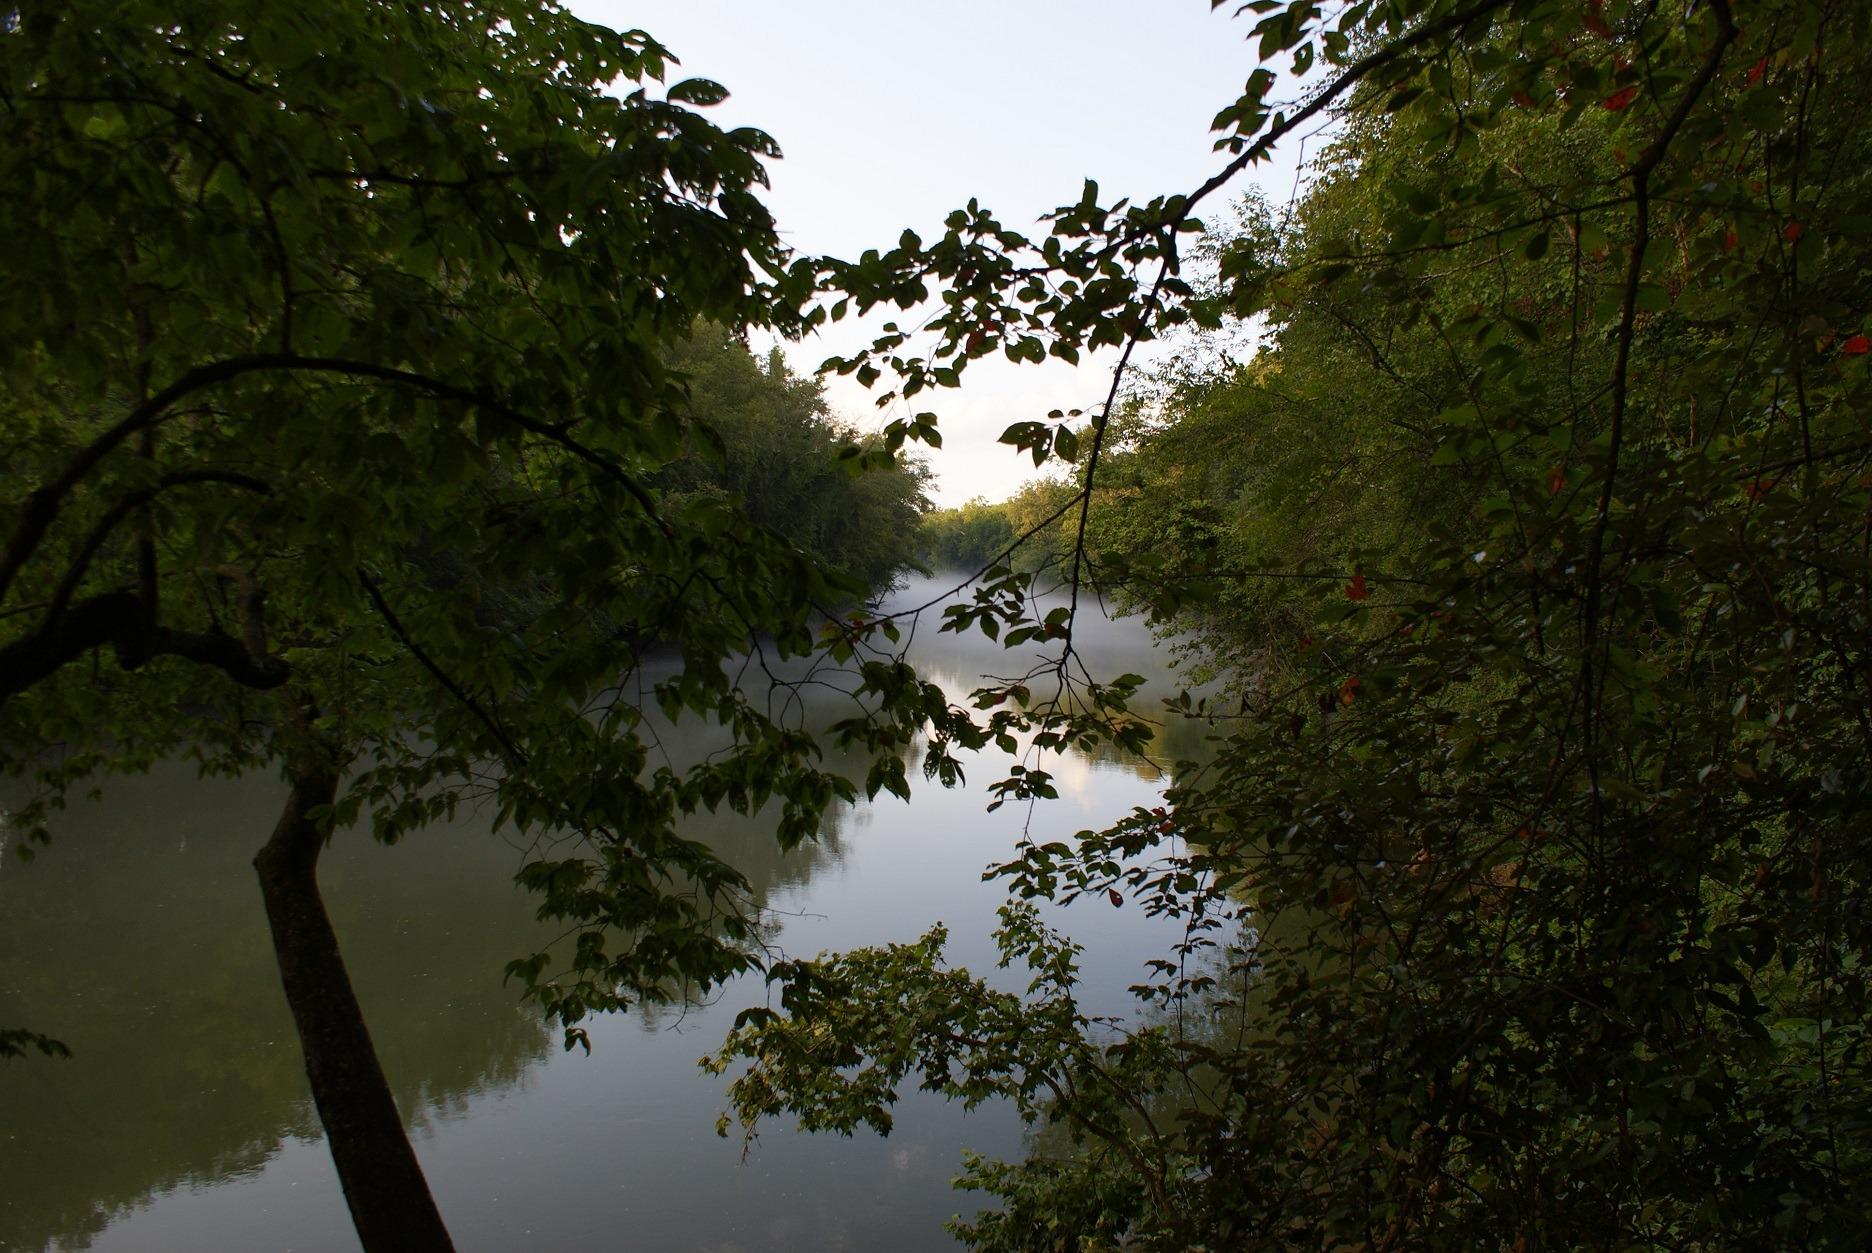 The Chattahoochee River in Georgia.